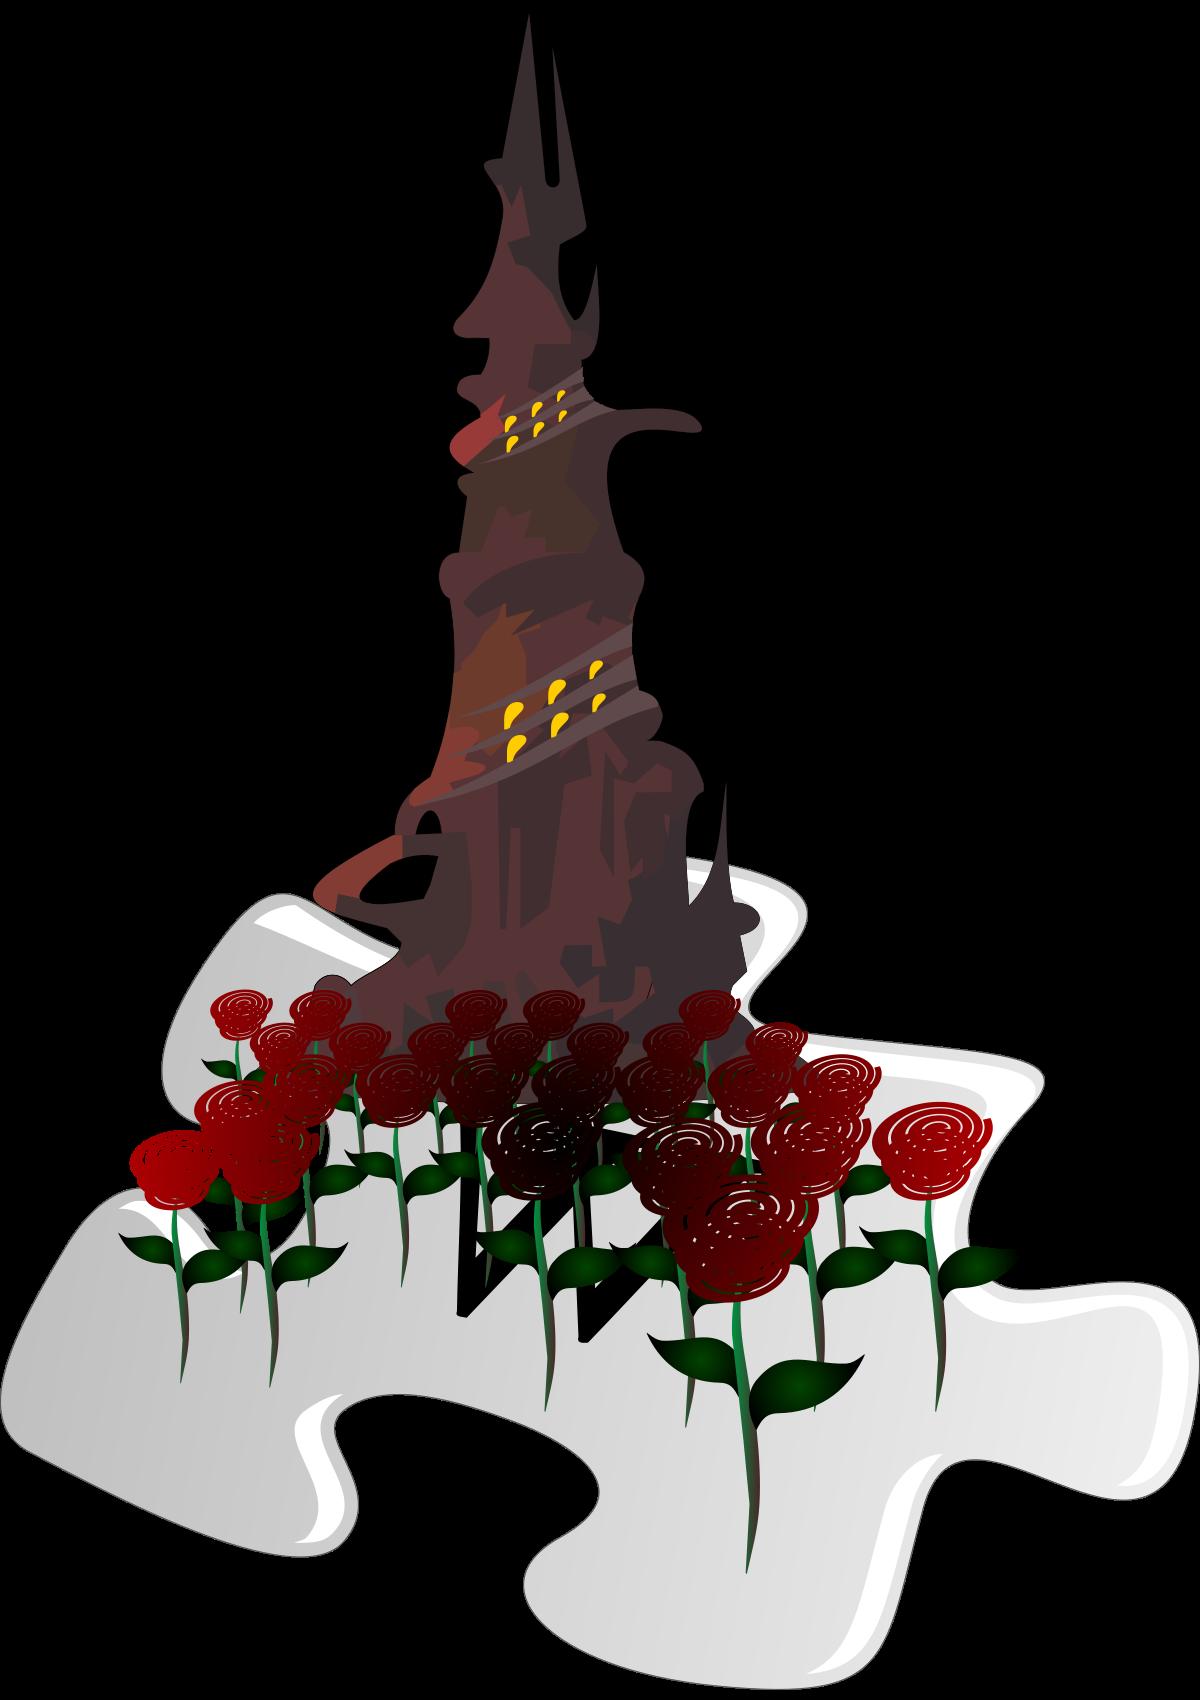 Dark Tower clipart #11, Download drawings